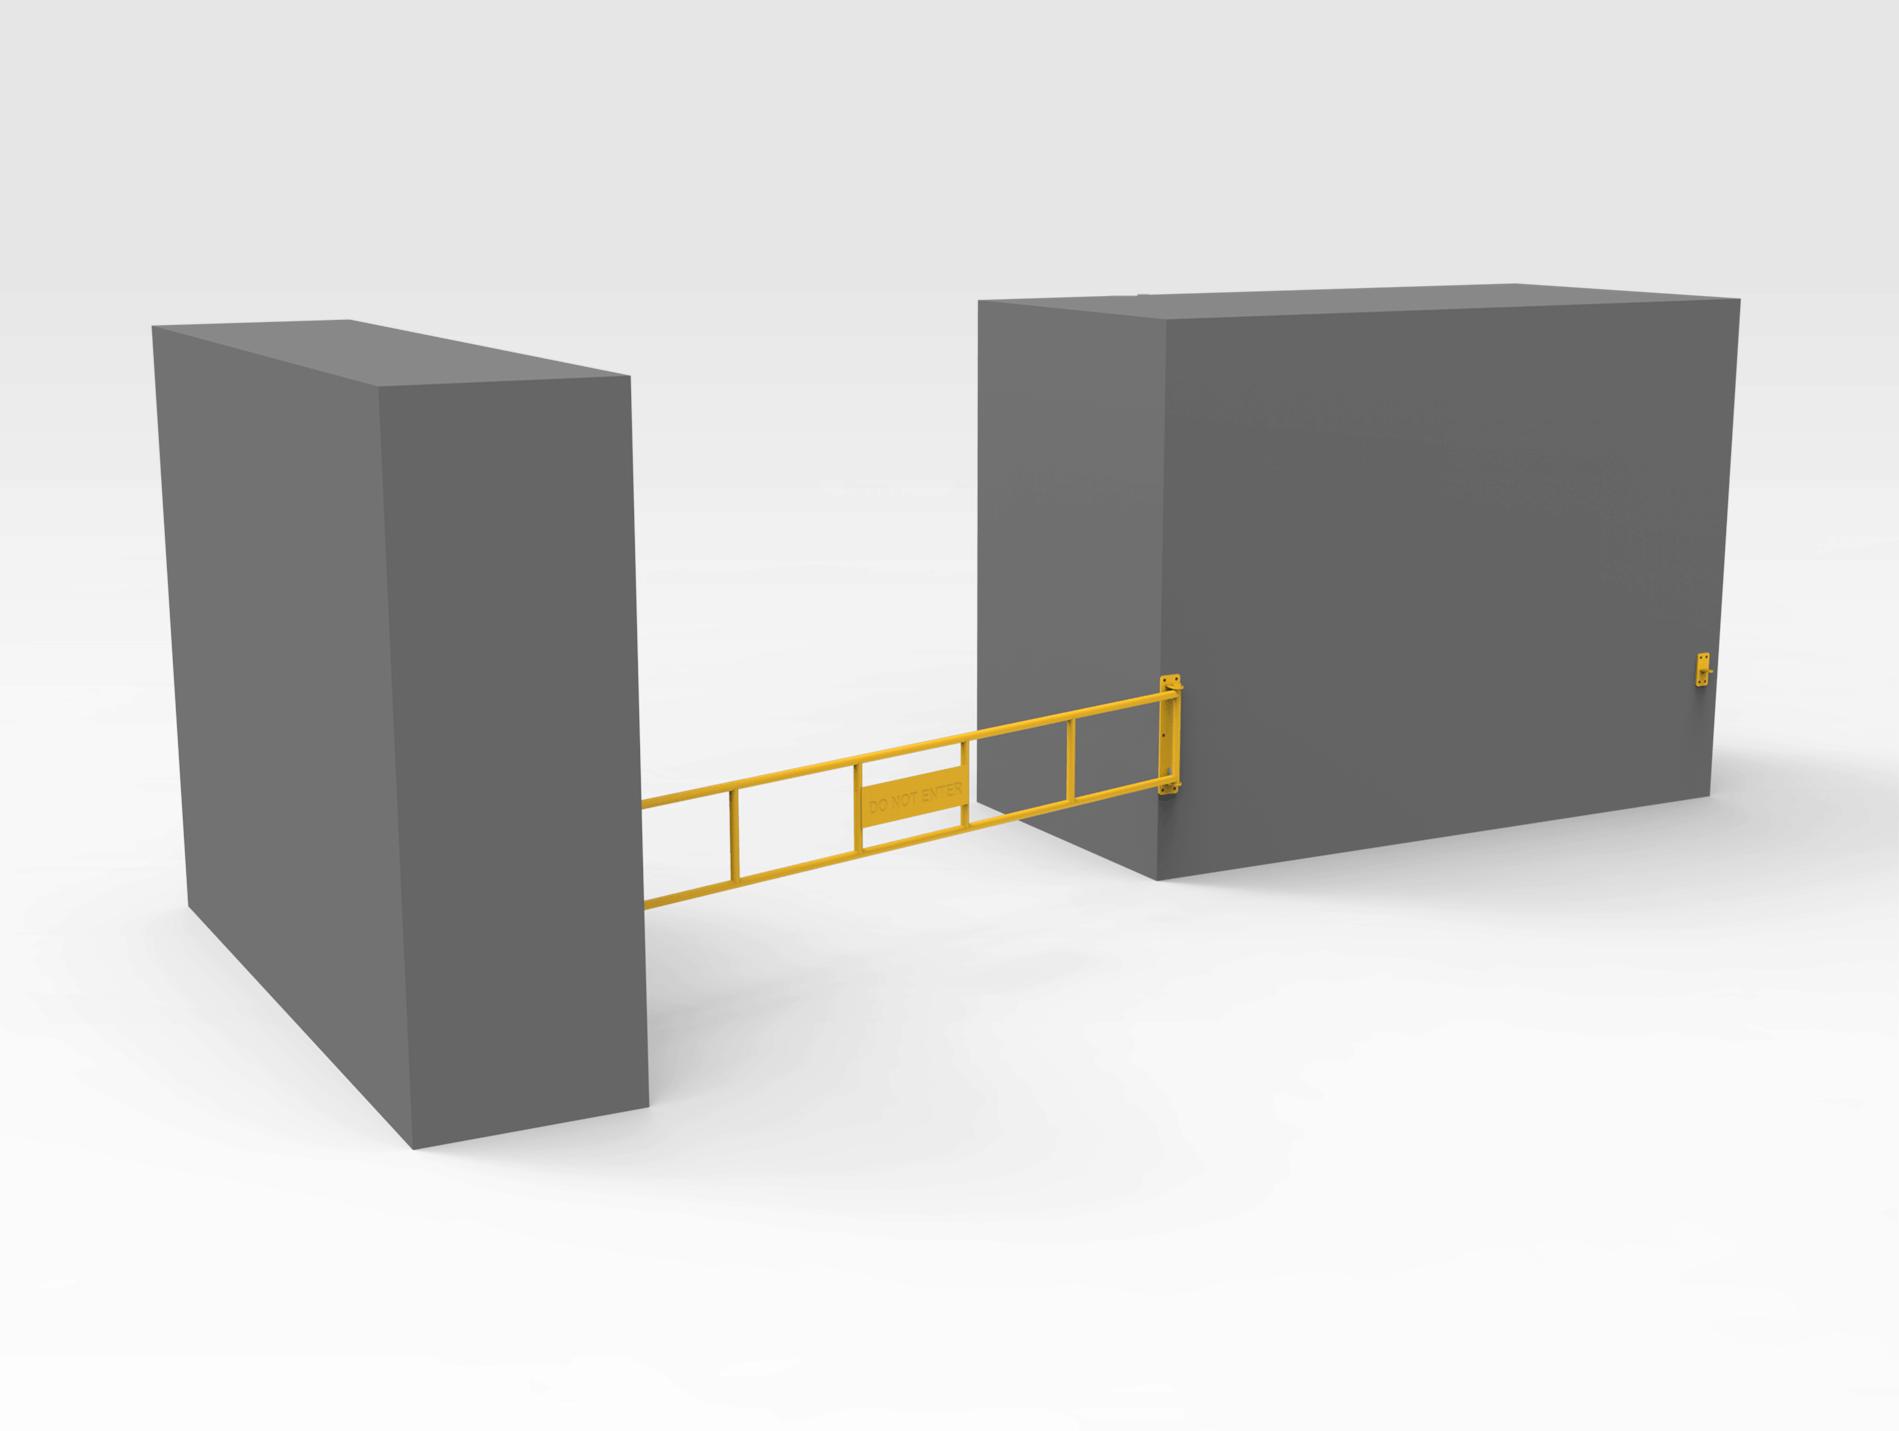 Lockable Gate 3830mm